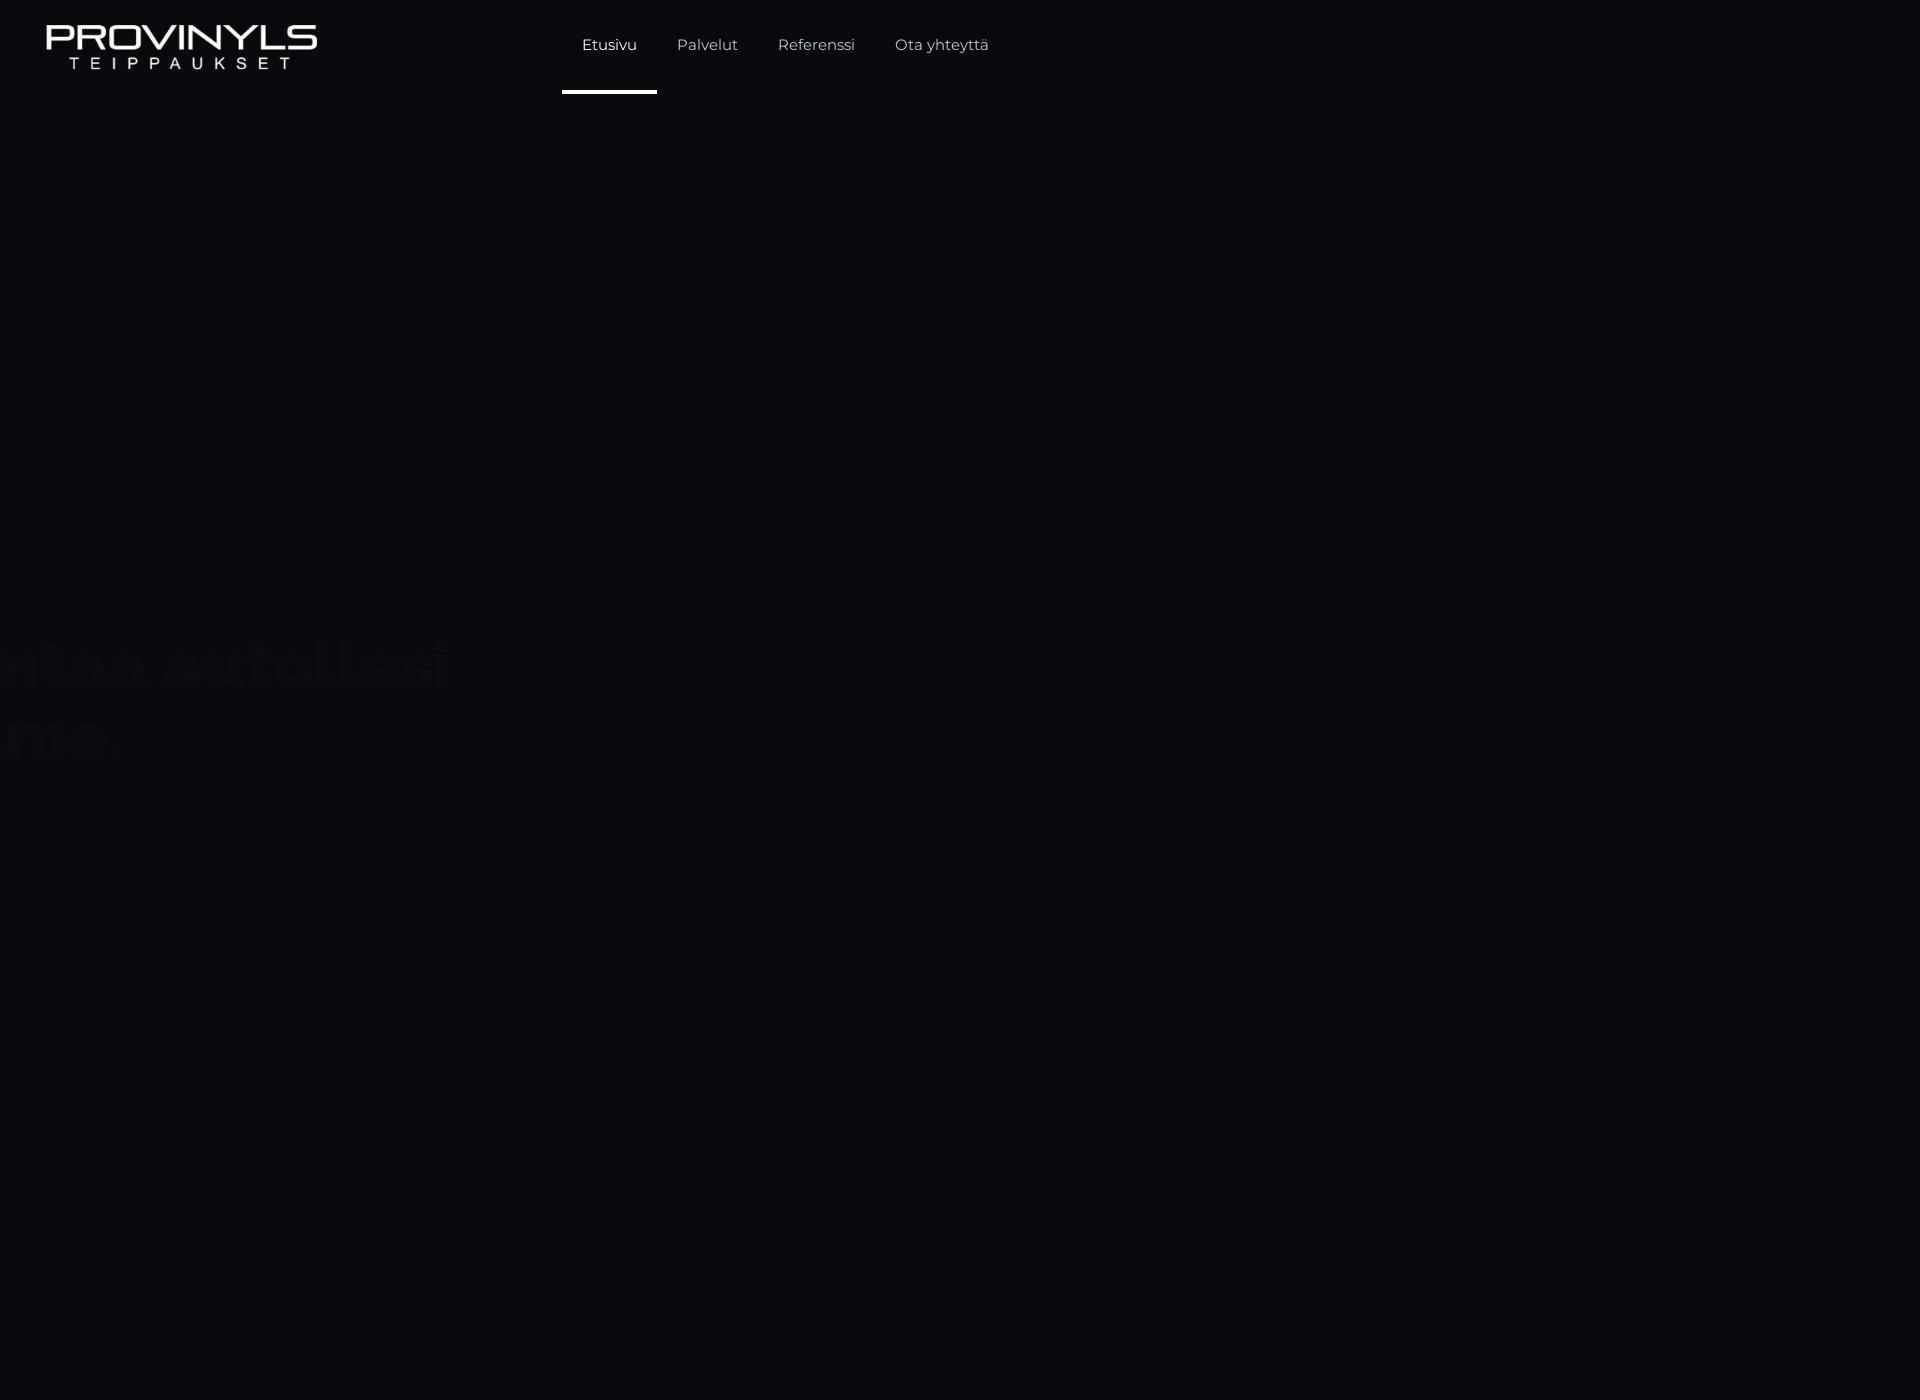 Screenshot for provinyls.fi